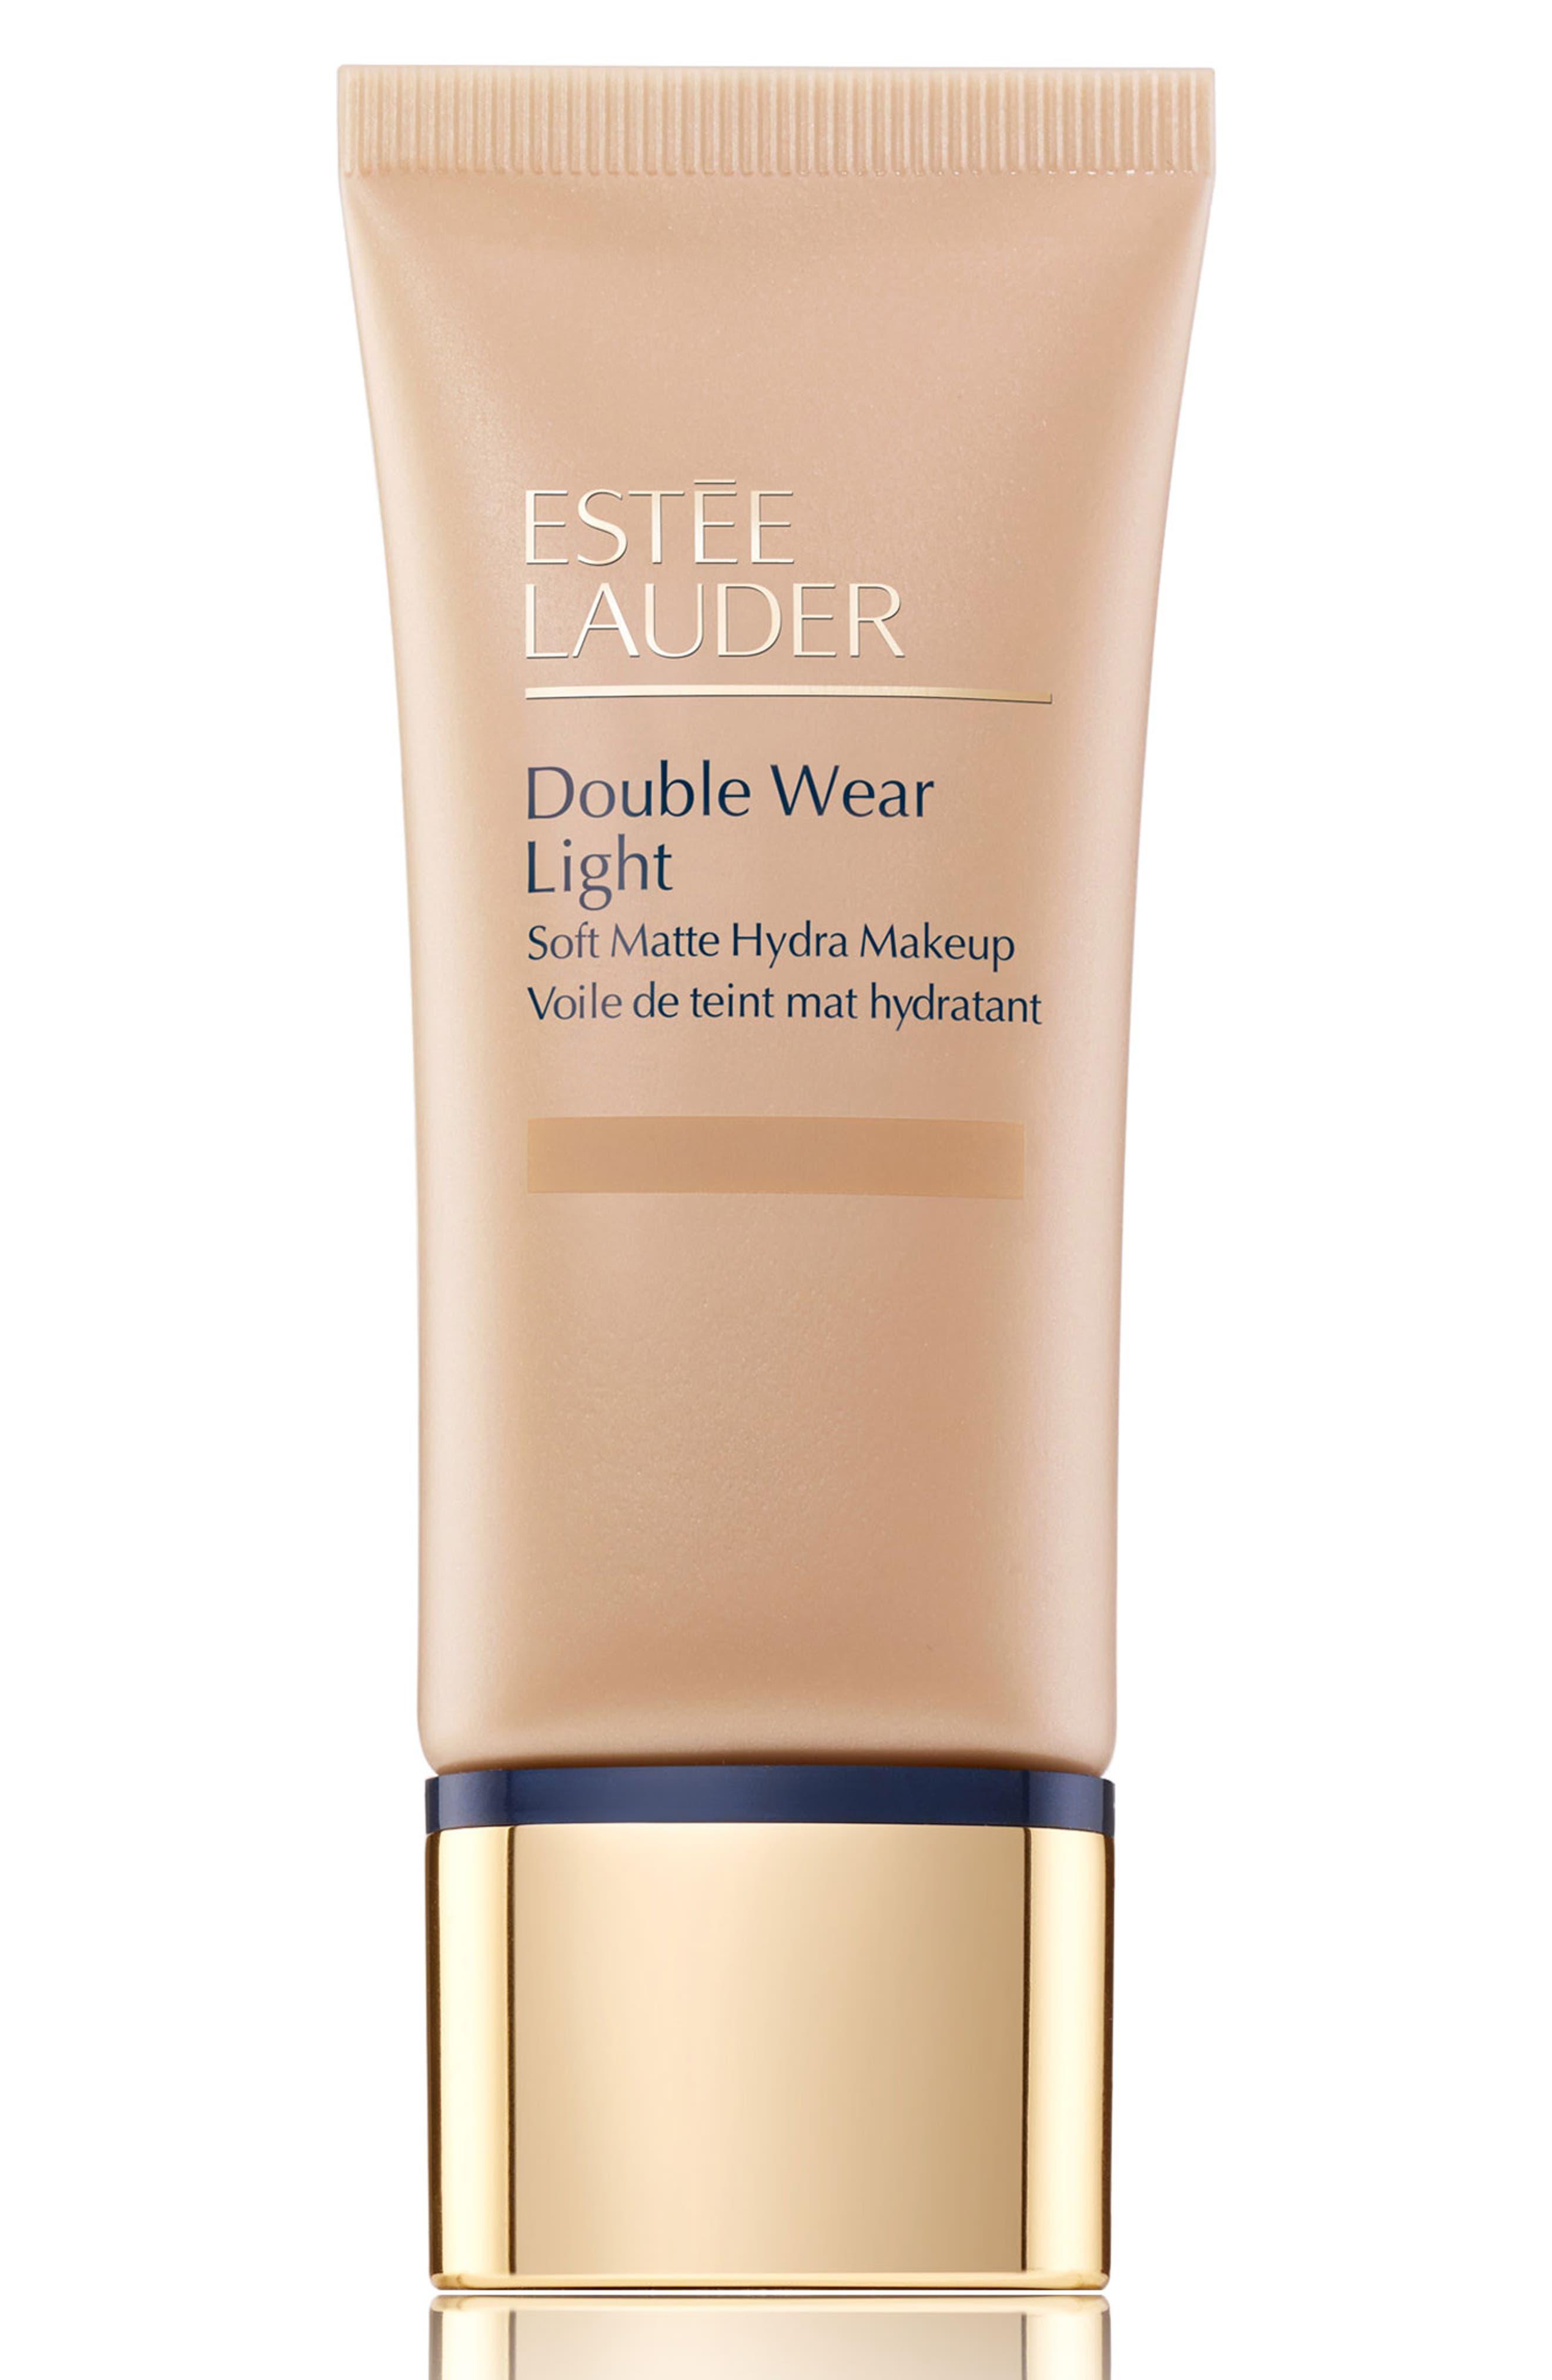 Estee Lauder Double Wear Light Soft Matte Hydra Makeup - 1W2 Sand